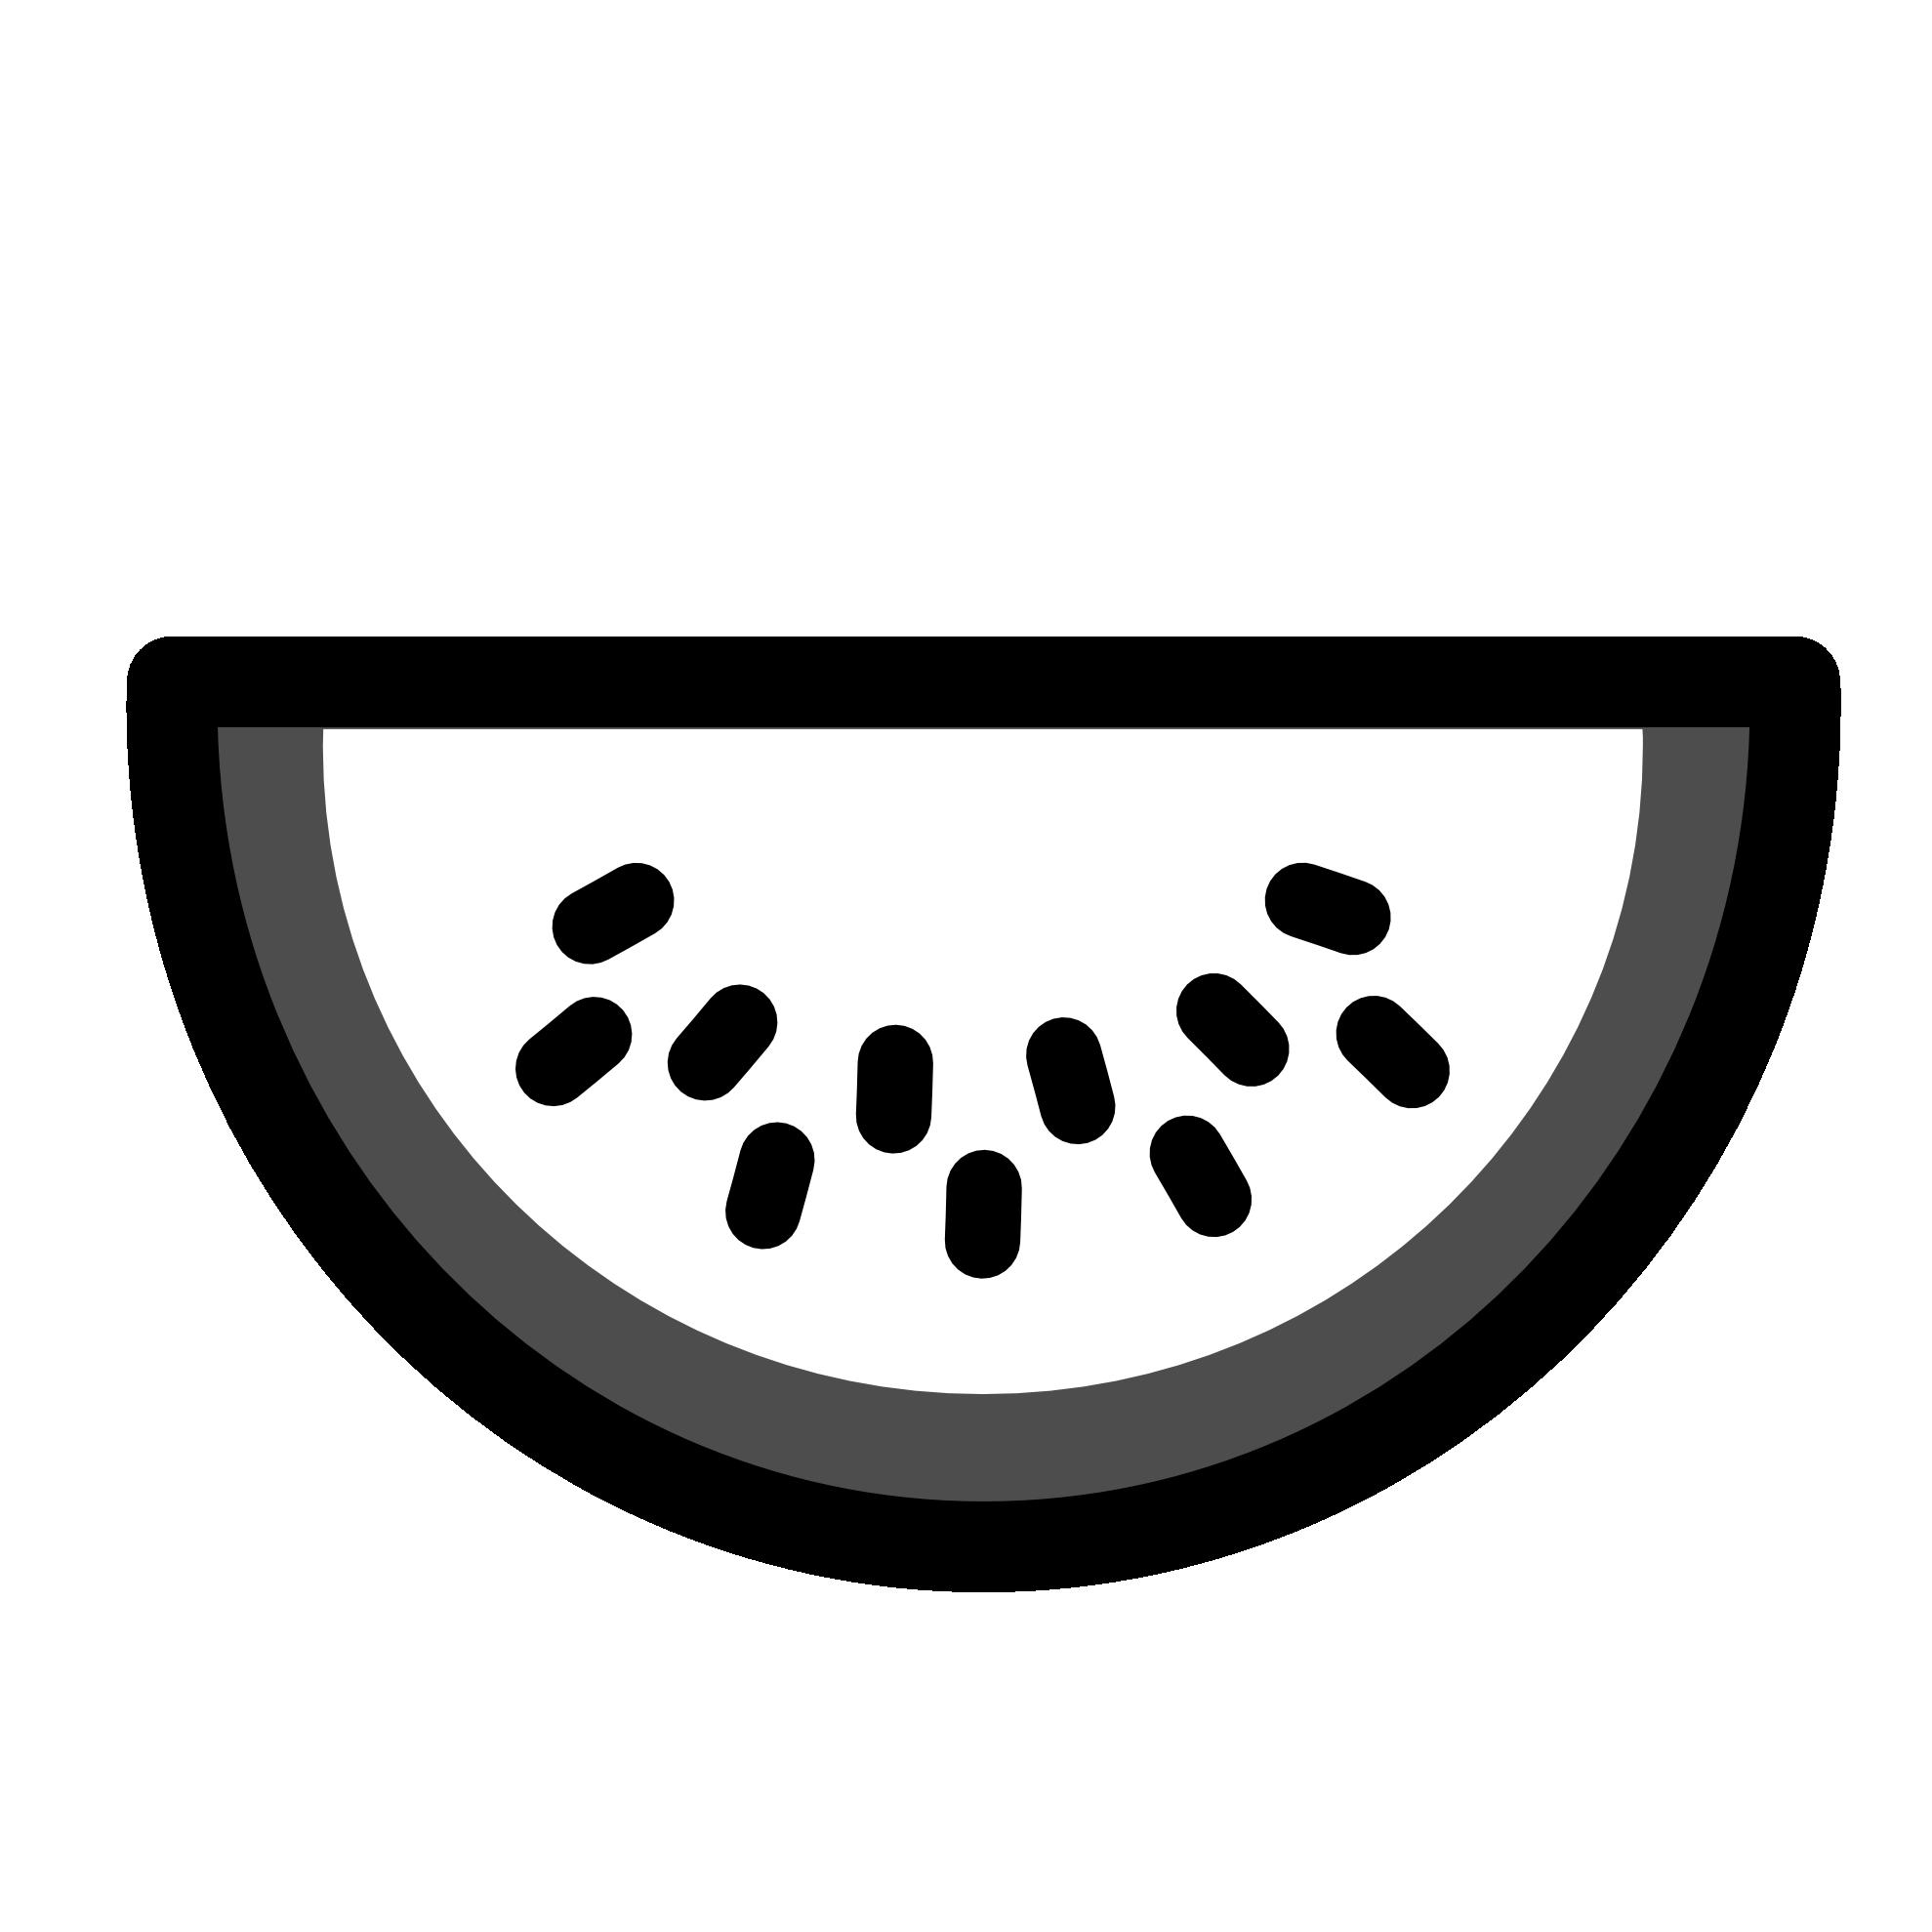 1979x1979 Black And White Watermelon Clipart Clipart Panda